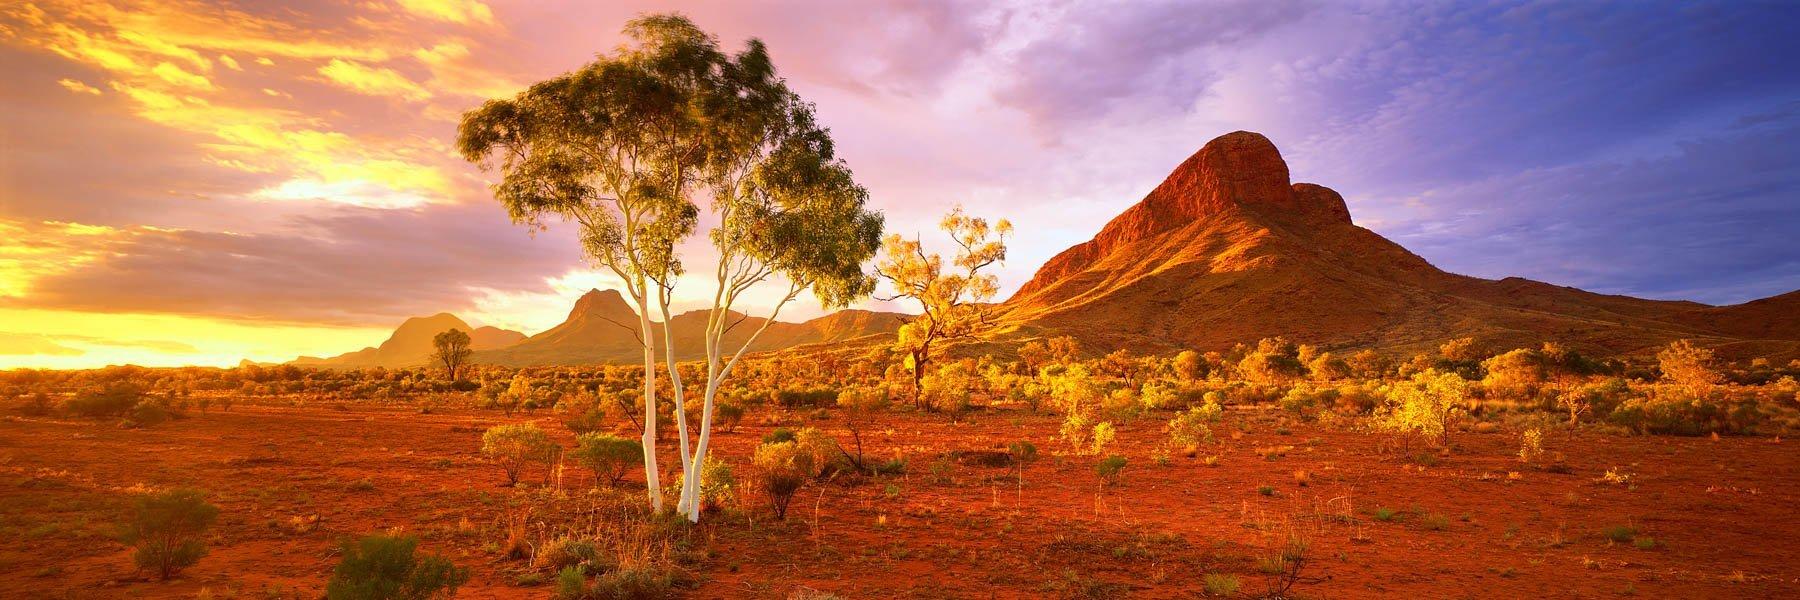 Golden sunset over Haasts Bluff, NT, Australia.